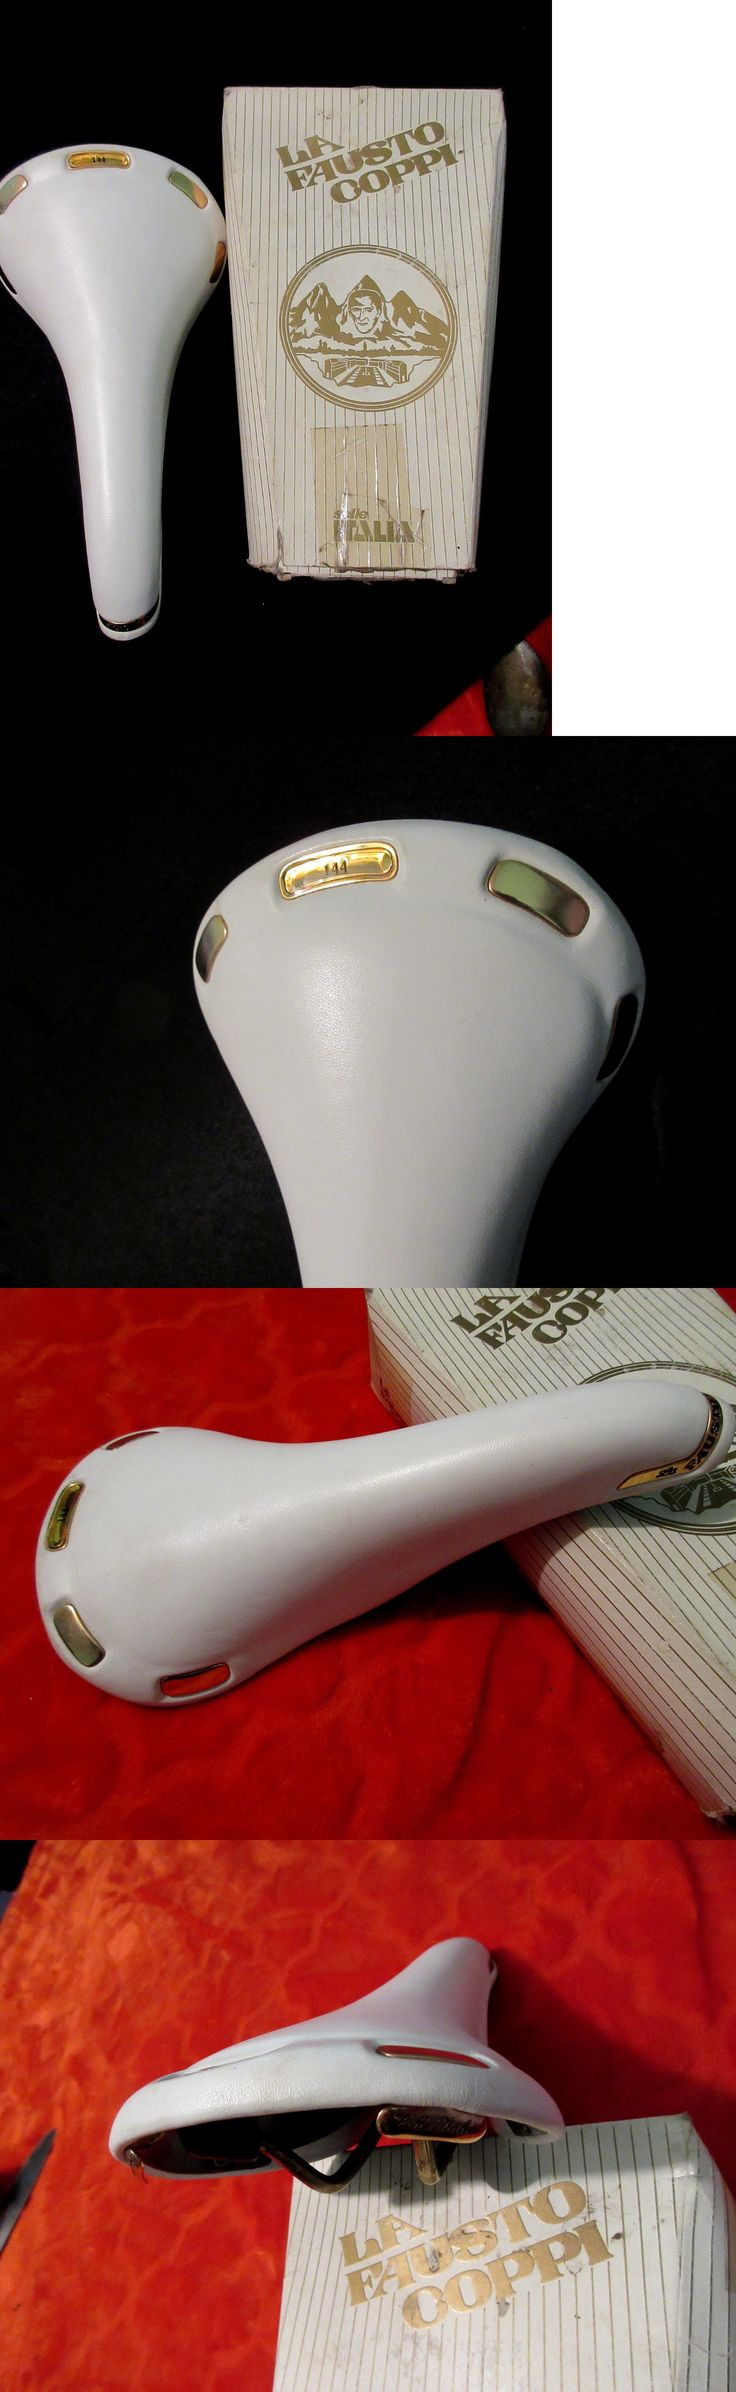 Saddles Seats 177822: Nos Selle Italia La Fausto Coppi Saddle # 144 -> BUY IT NOW ONLY: $325 on eBay!